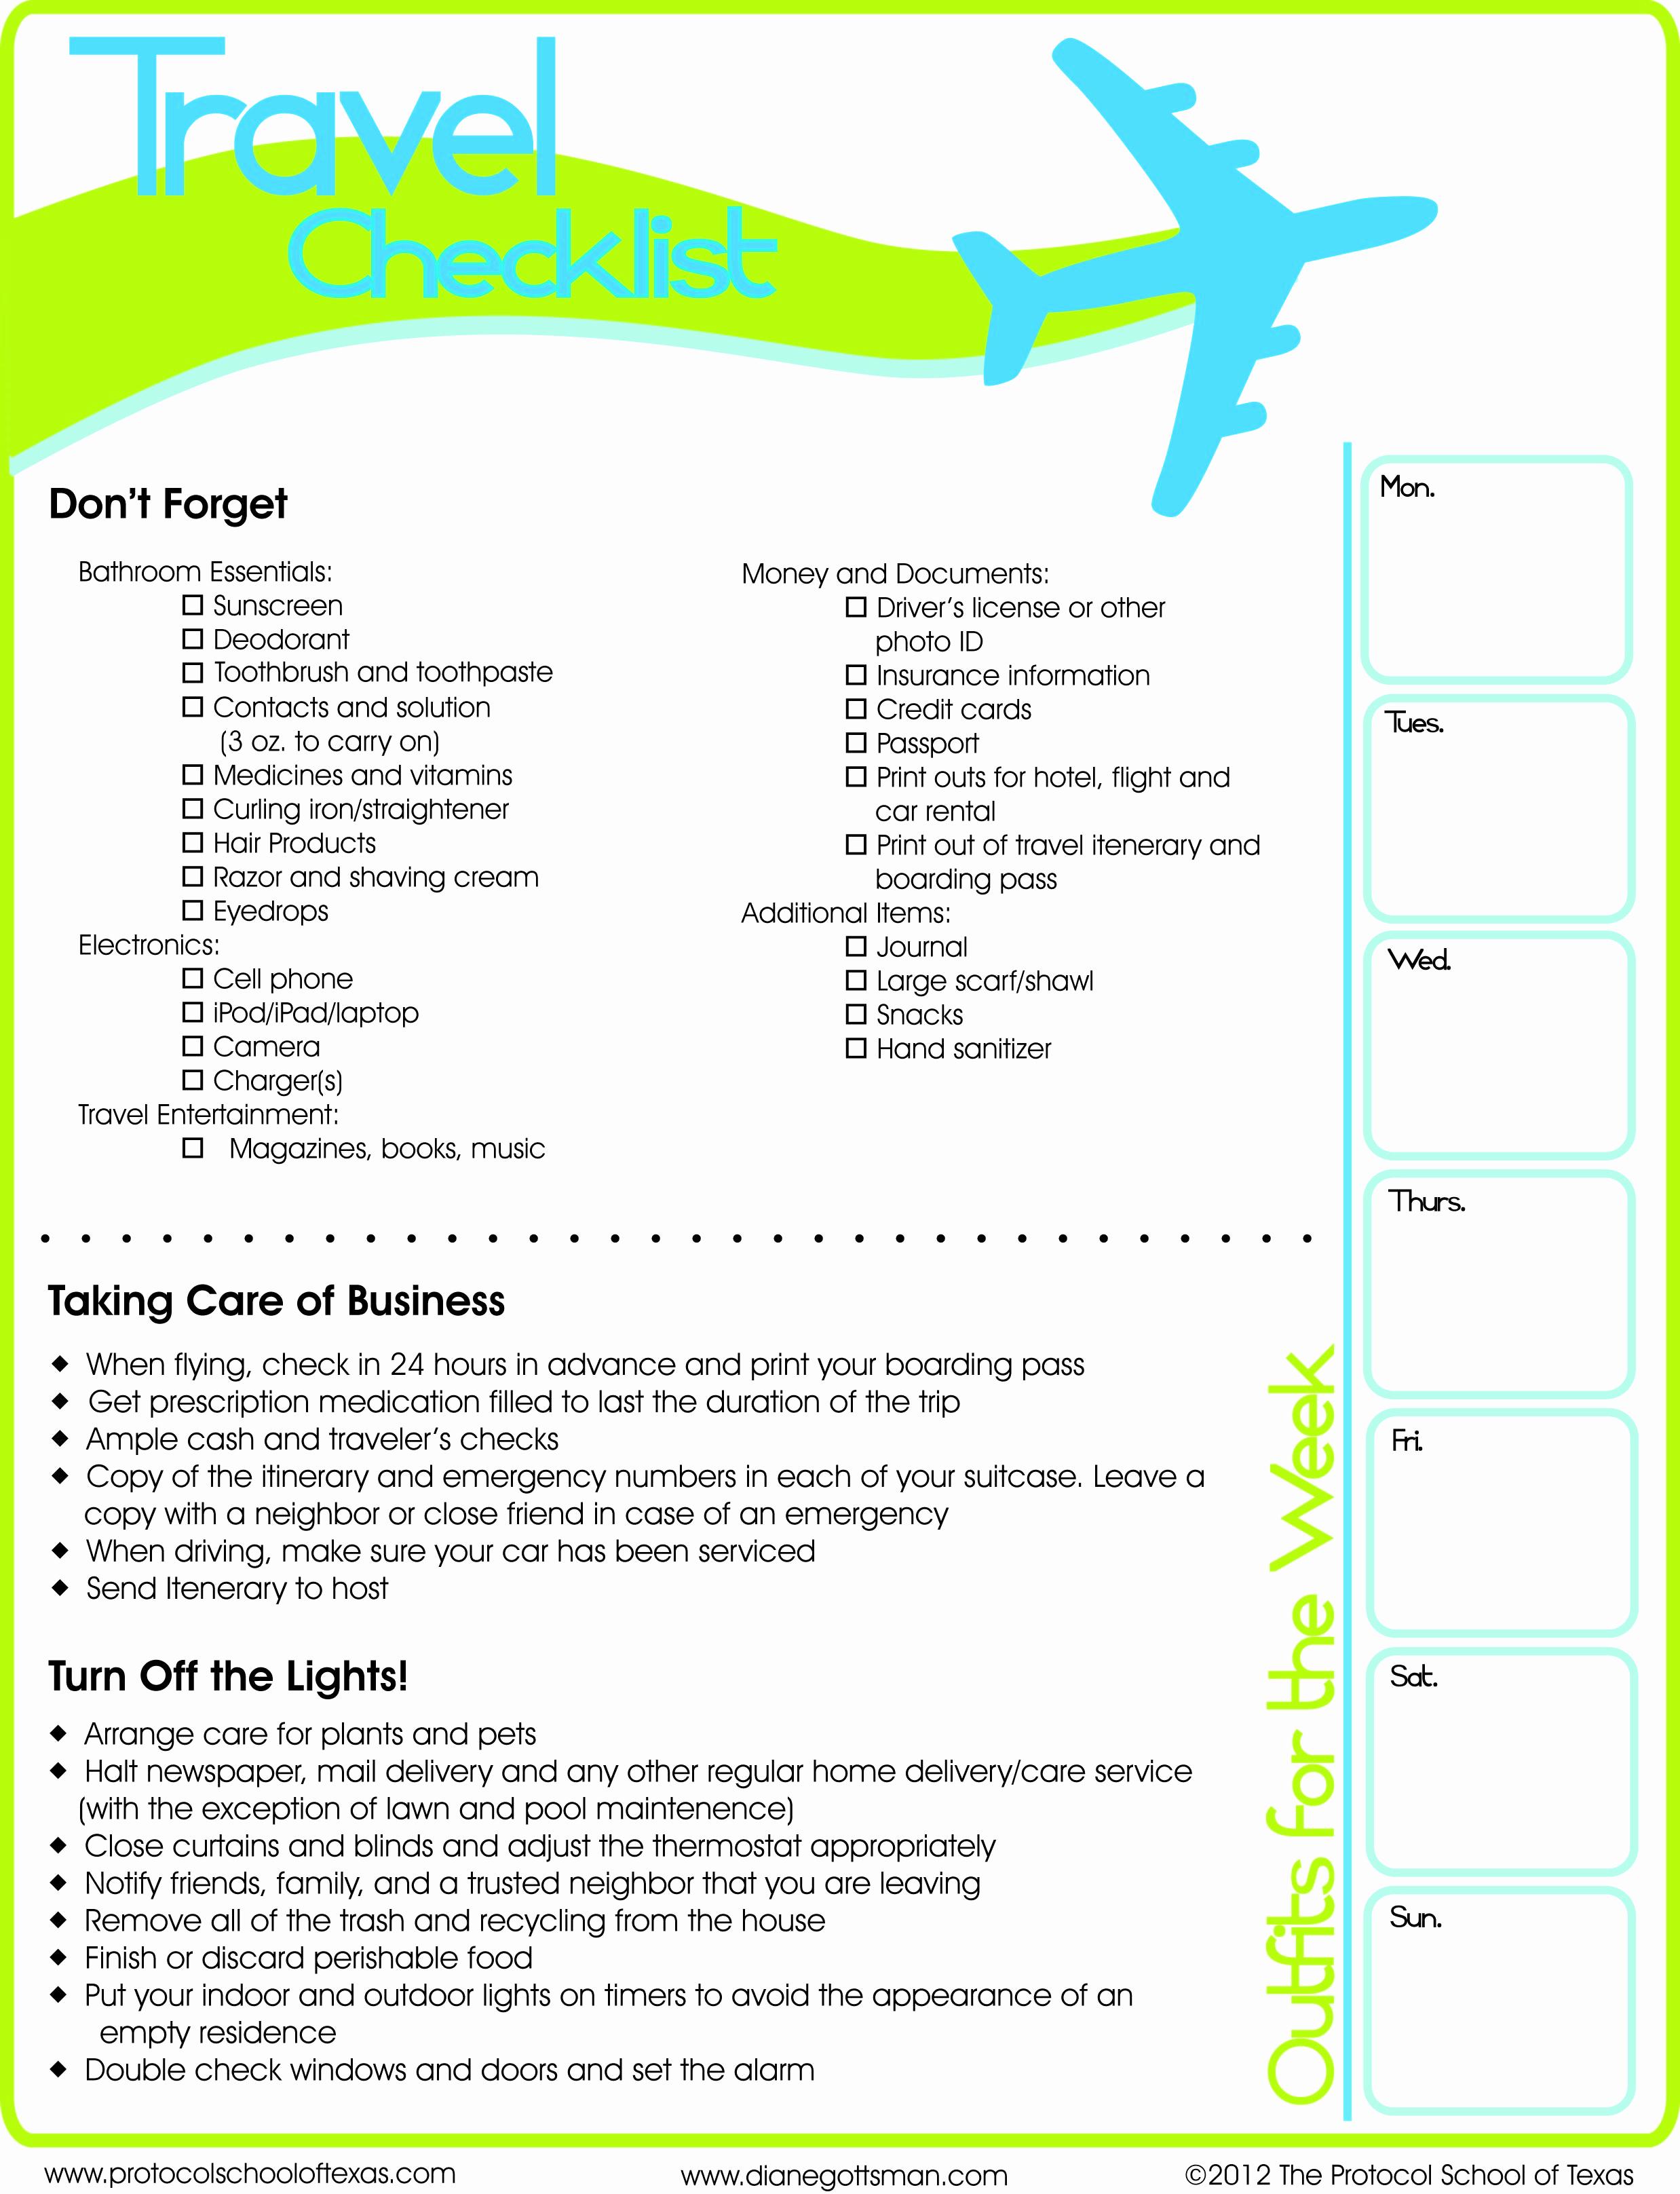 Travel Packing Checklist Pdf Best Of Travel Checklist Printable